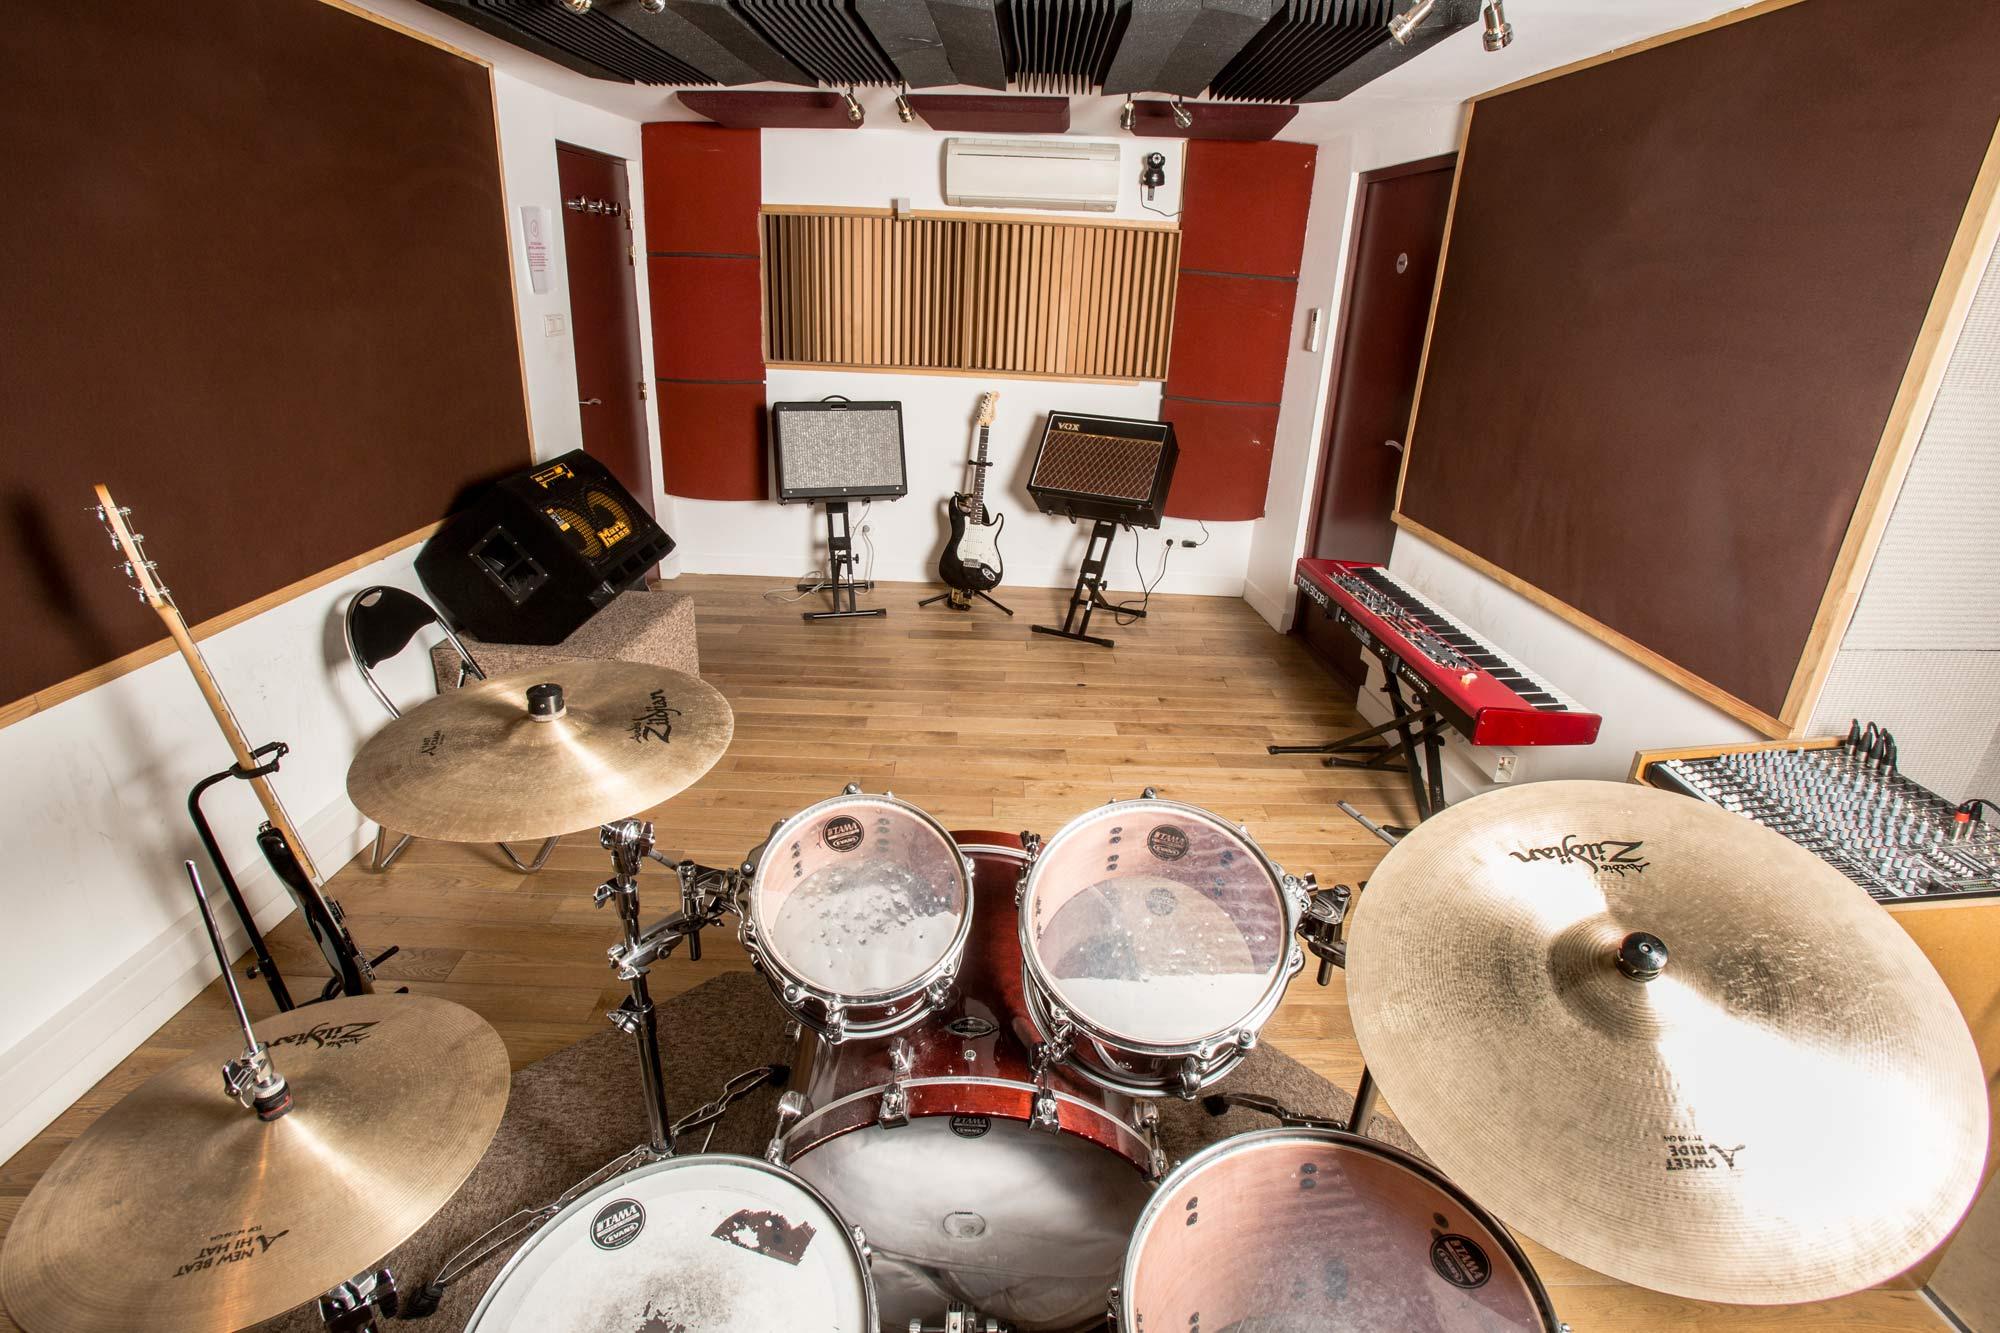 studios de r p tition paris tarifs hf music studio. Black Bedroom Furniture Sets. Home Design Ideas